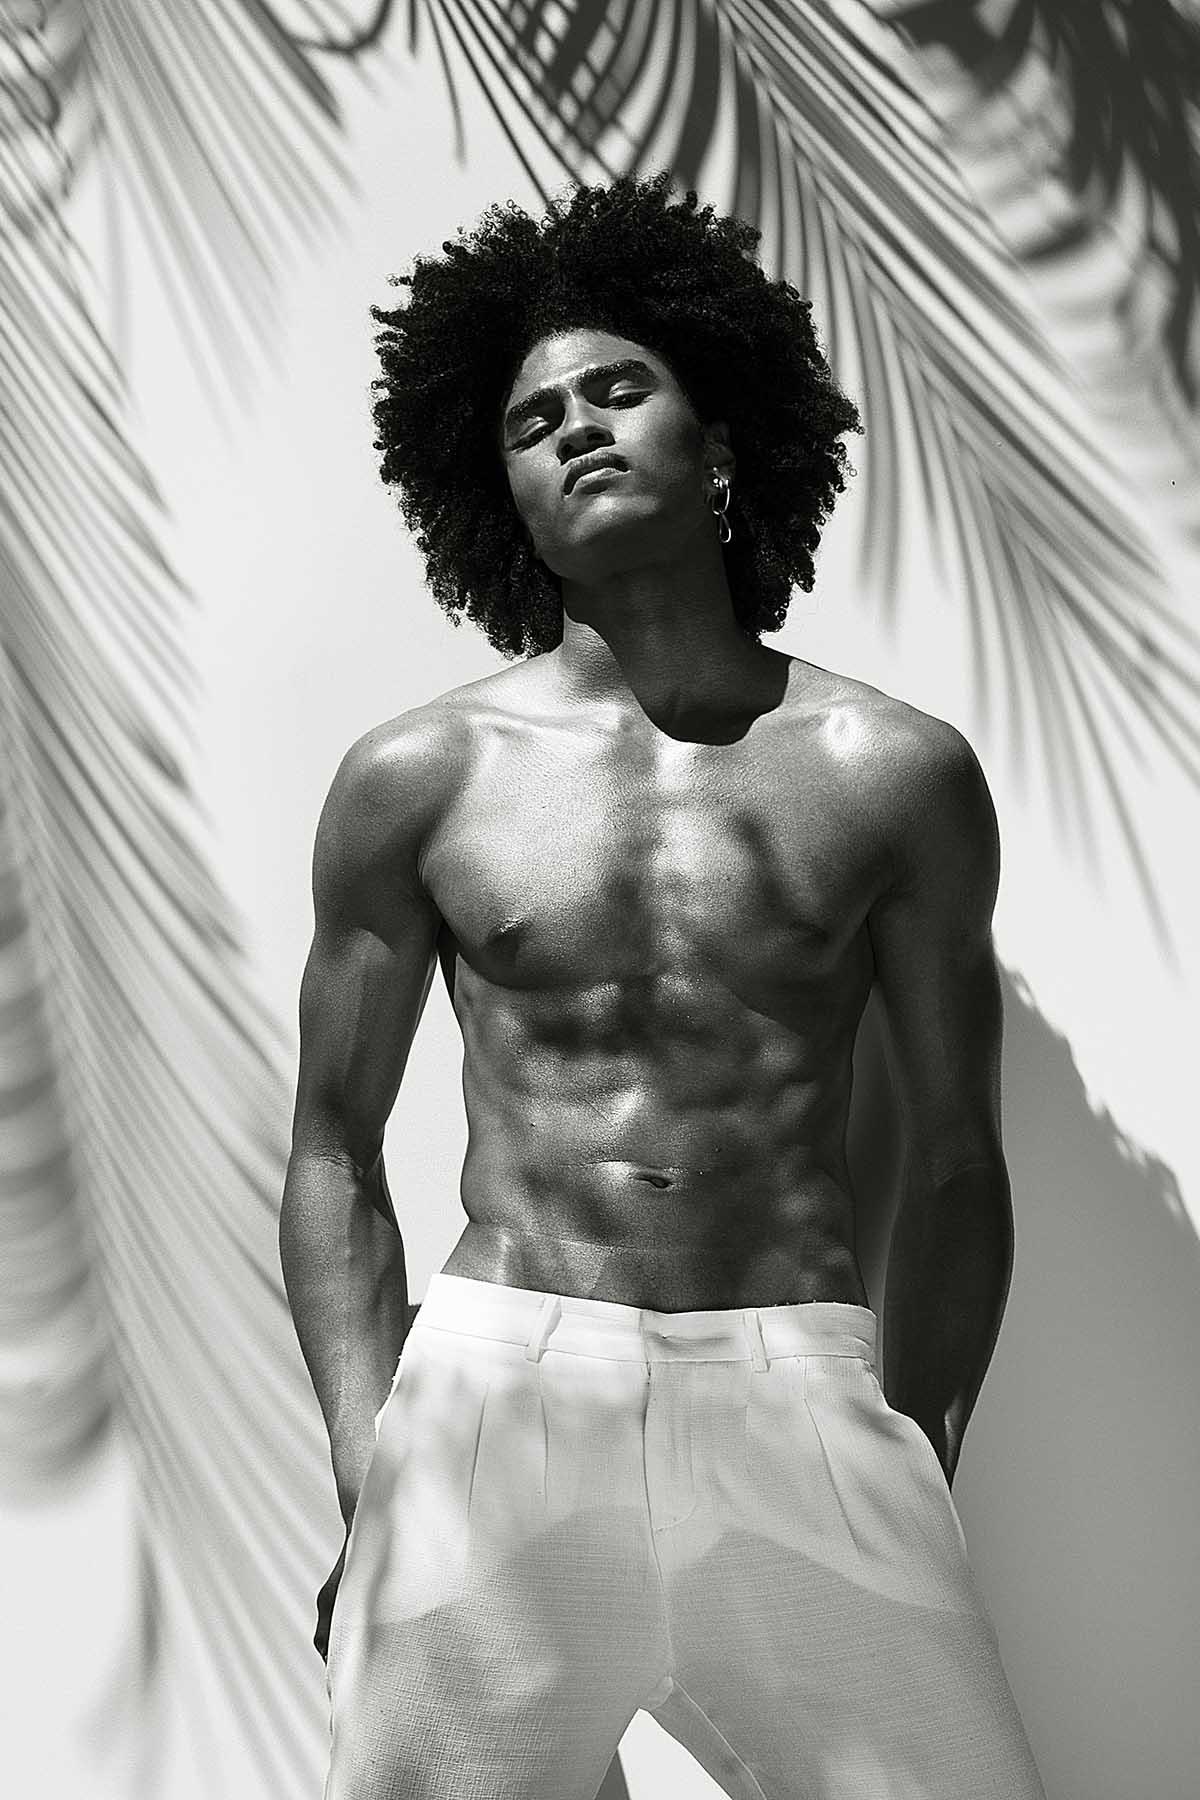 João Victor Marcos by Rodrigo Moura for Brazilian Male Model